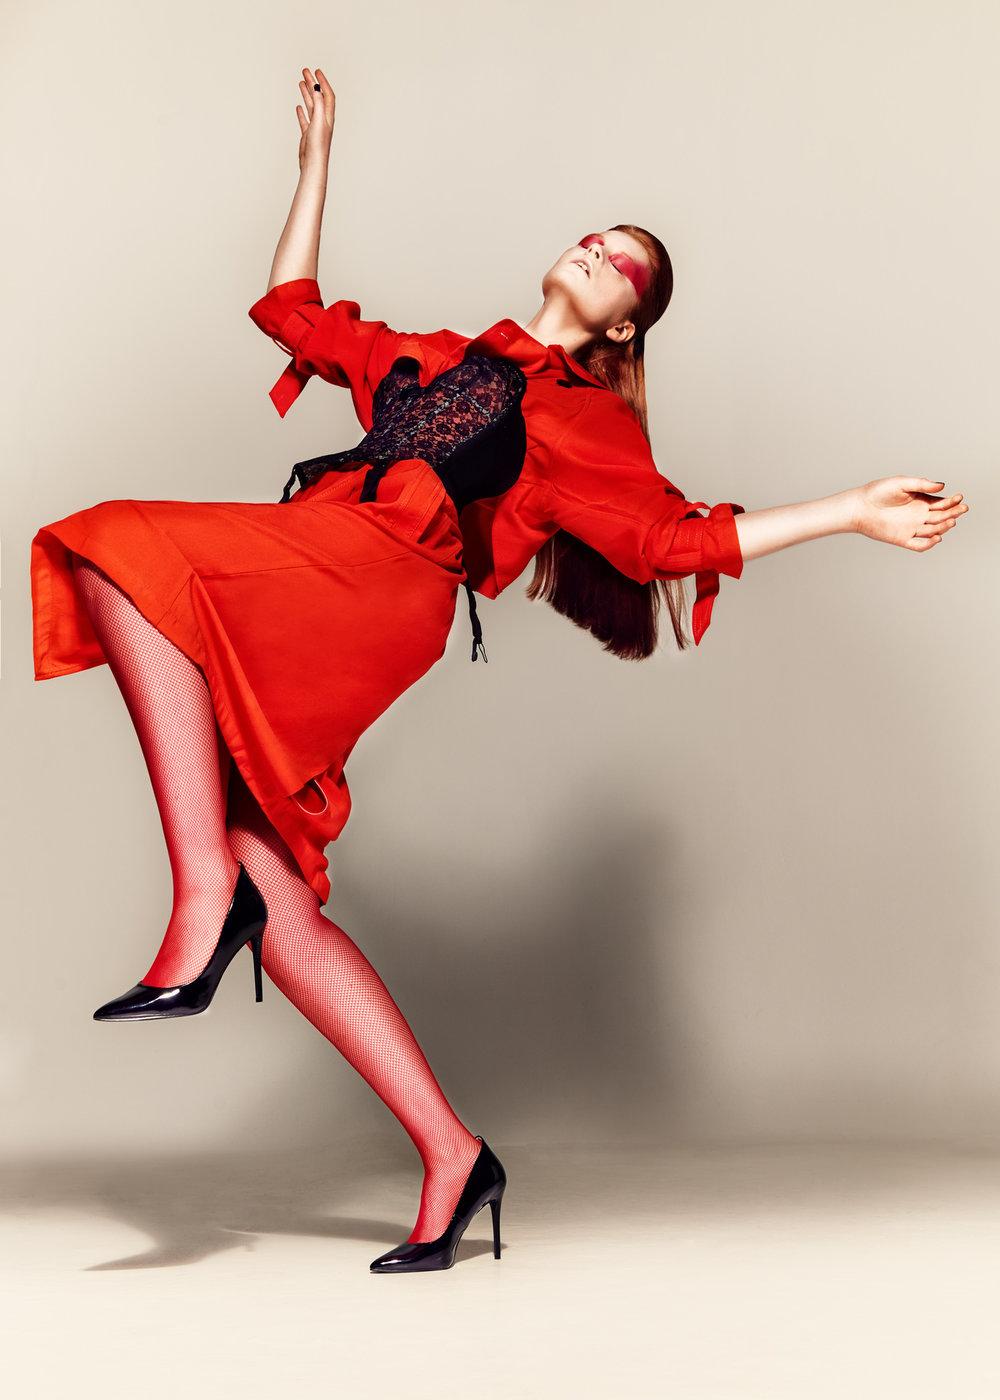 FashionEditorial_LouiseThomson.jpg